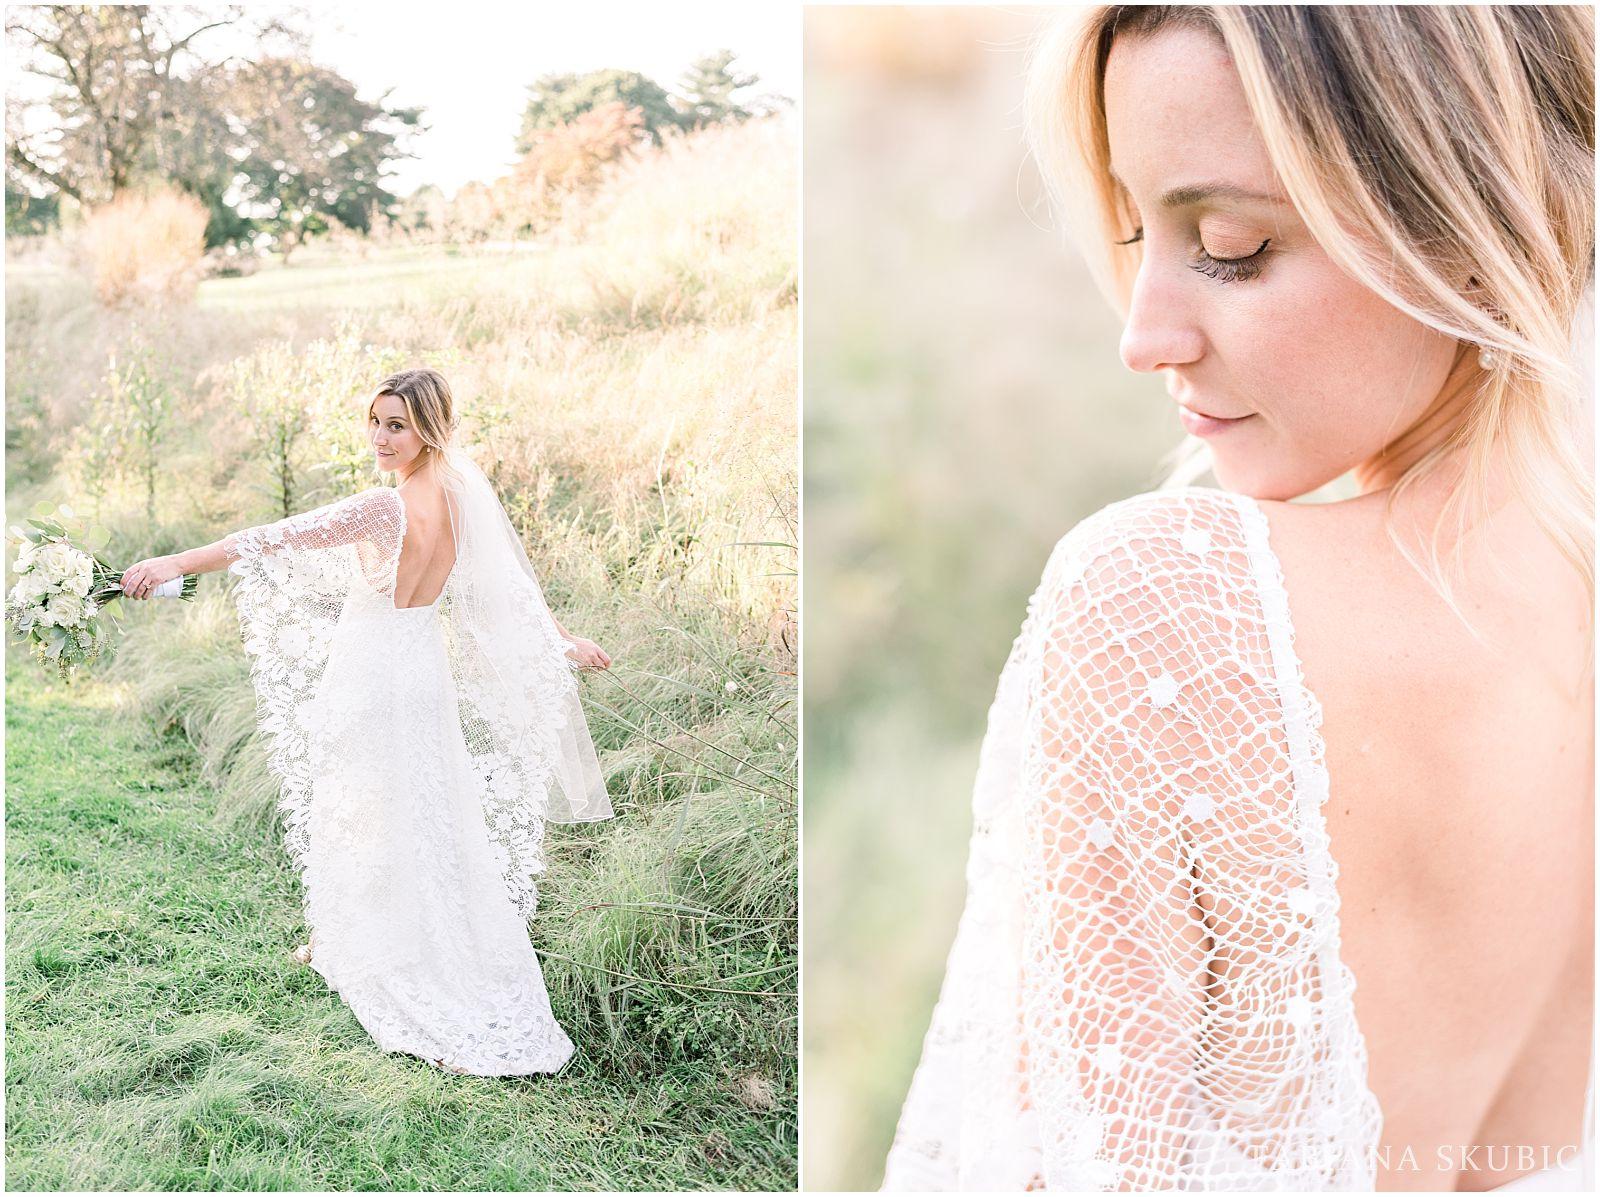 FabianaSkubic_H&M_Wedding_0064.jpg